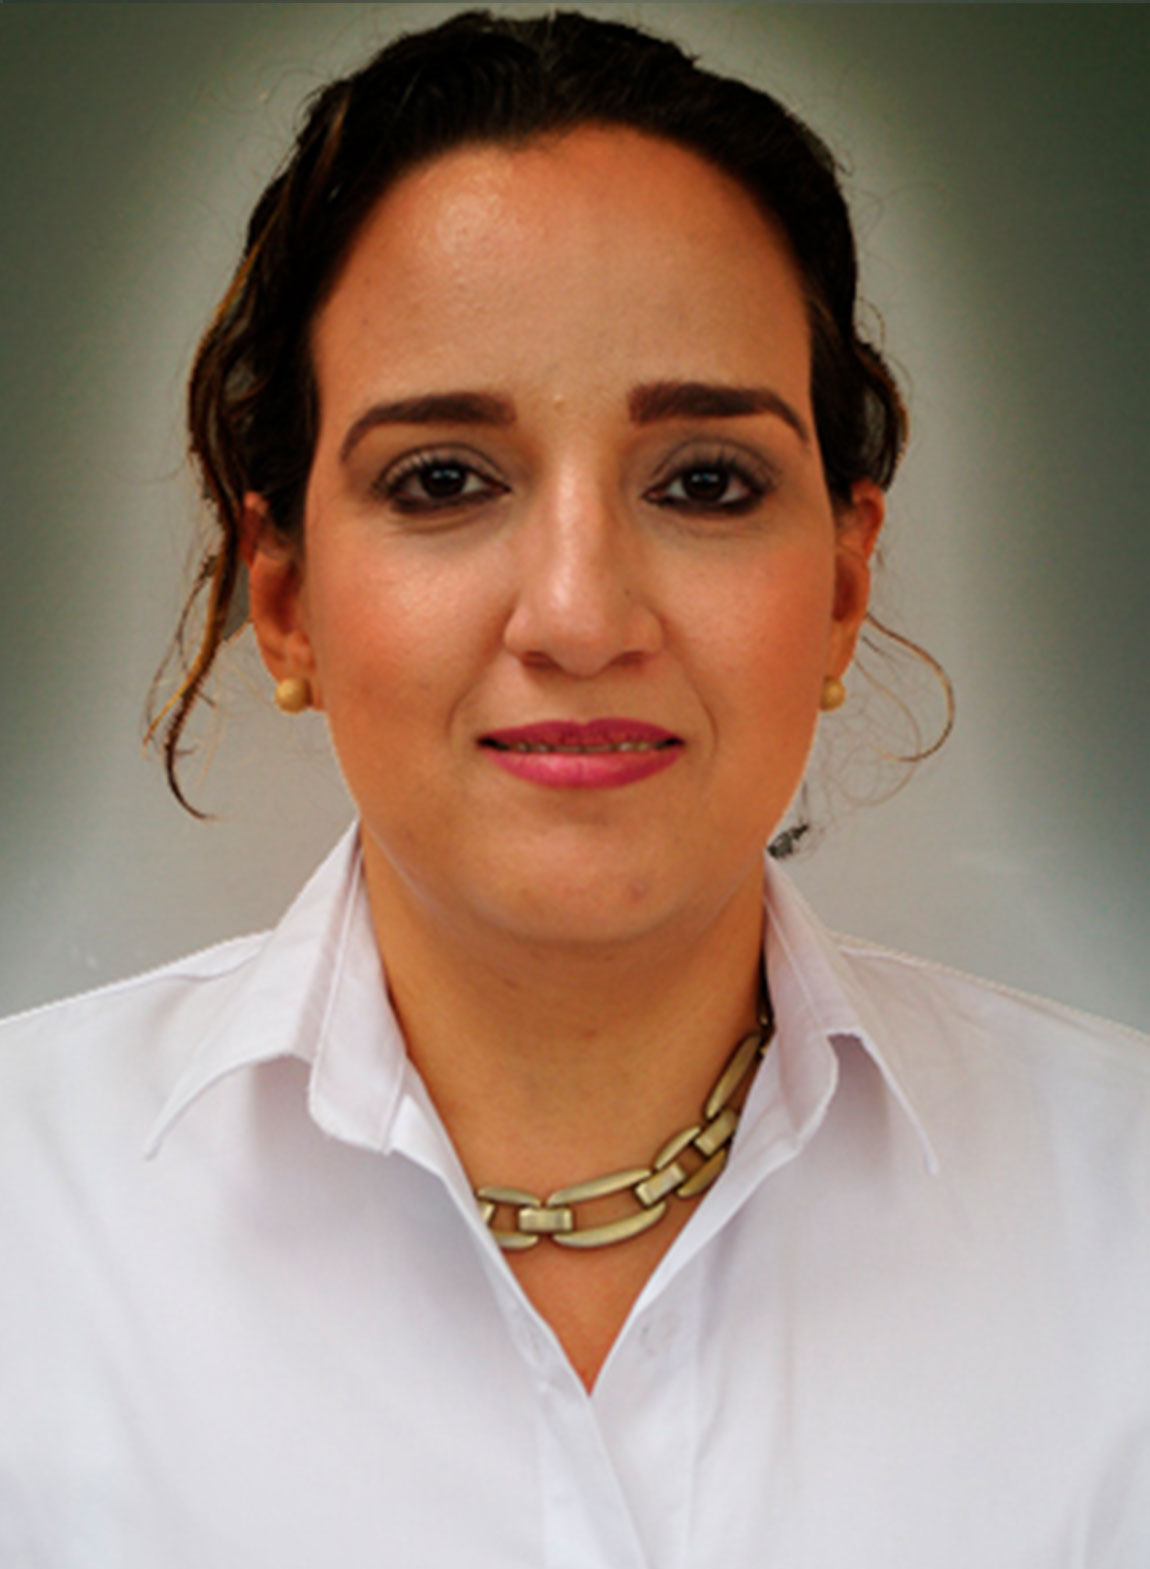 Lic. Yolanda Guadalupe del Castillo Torrontegui